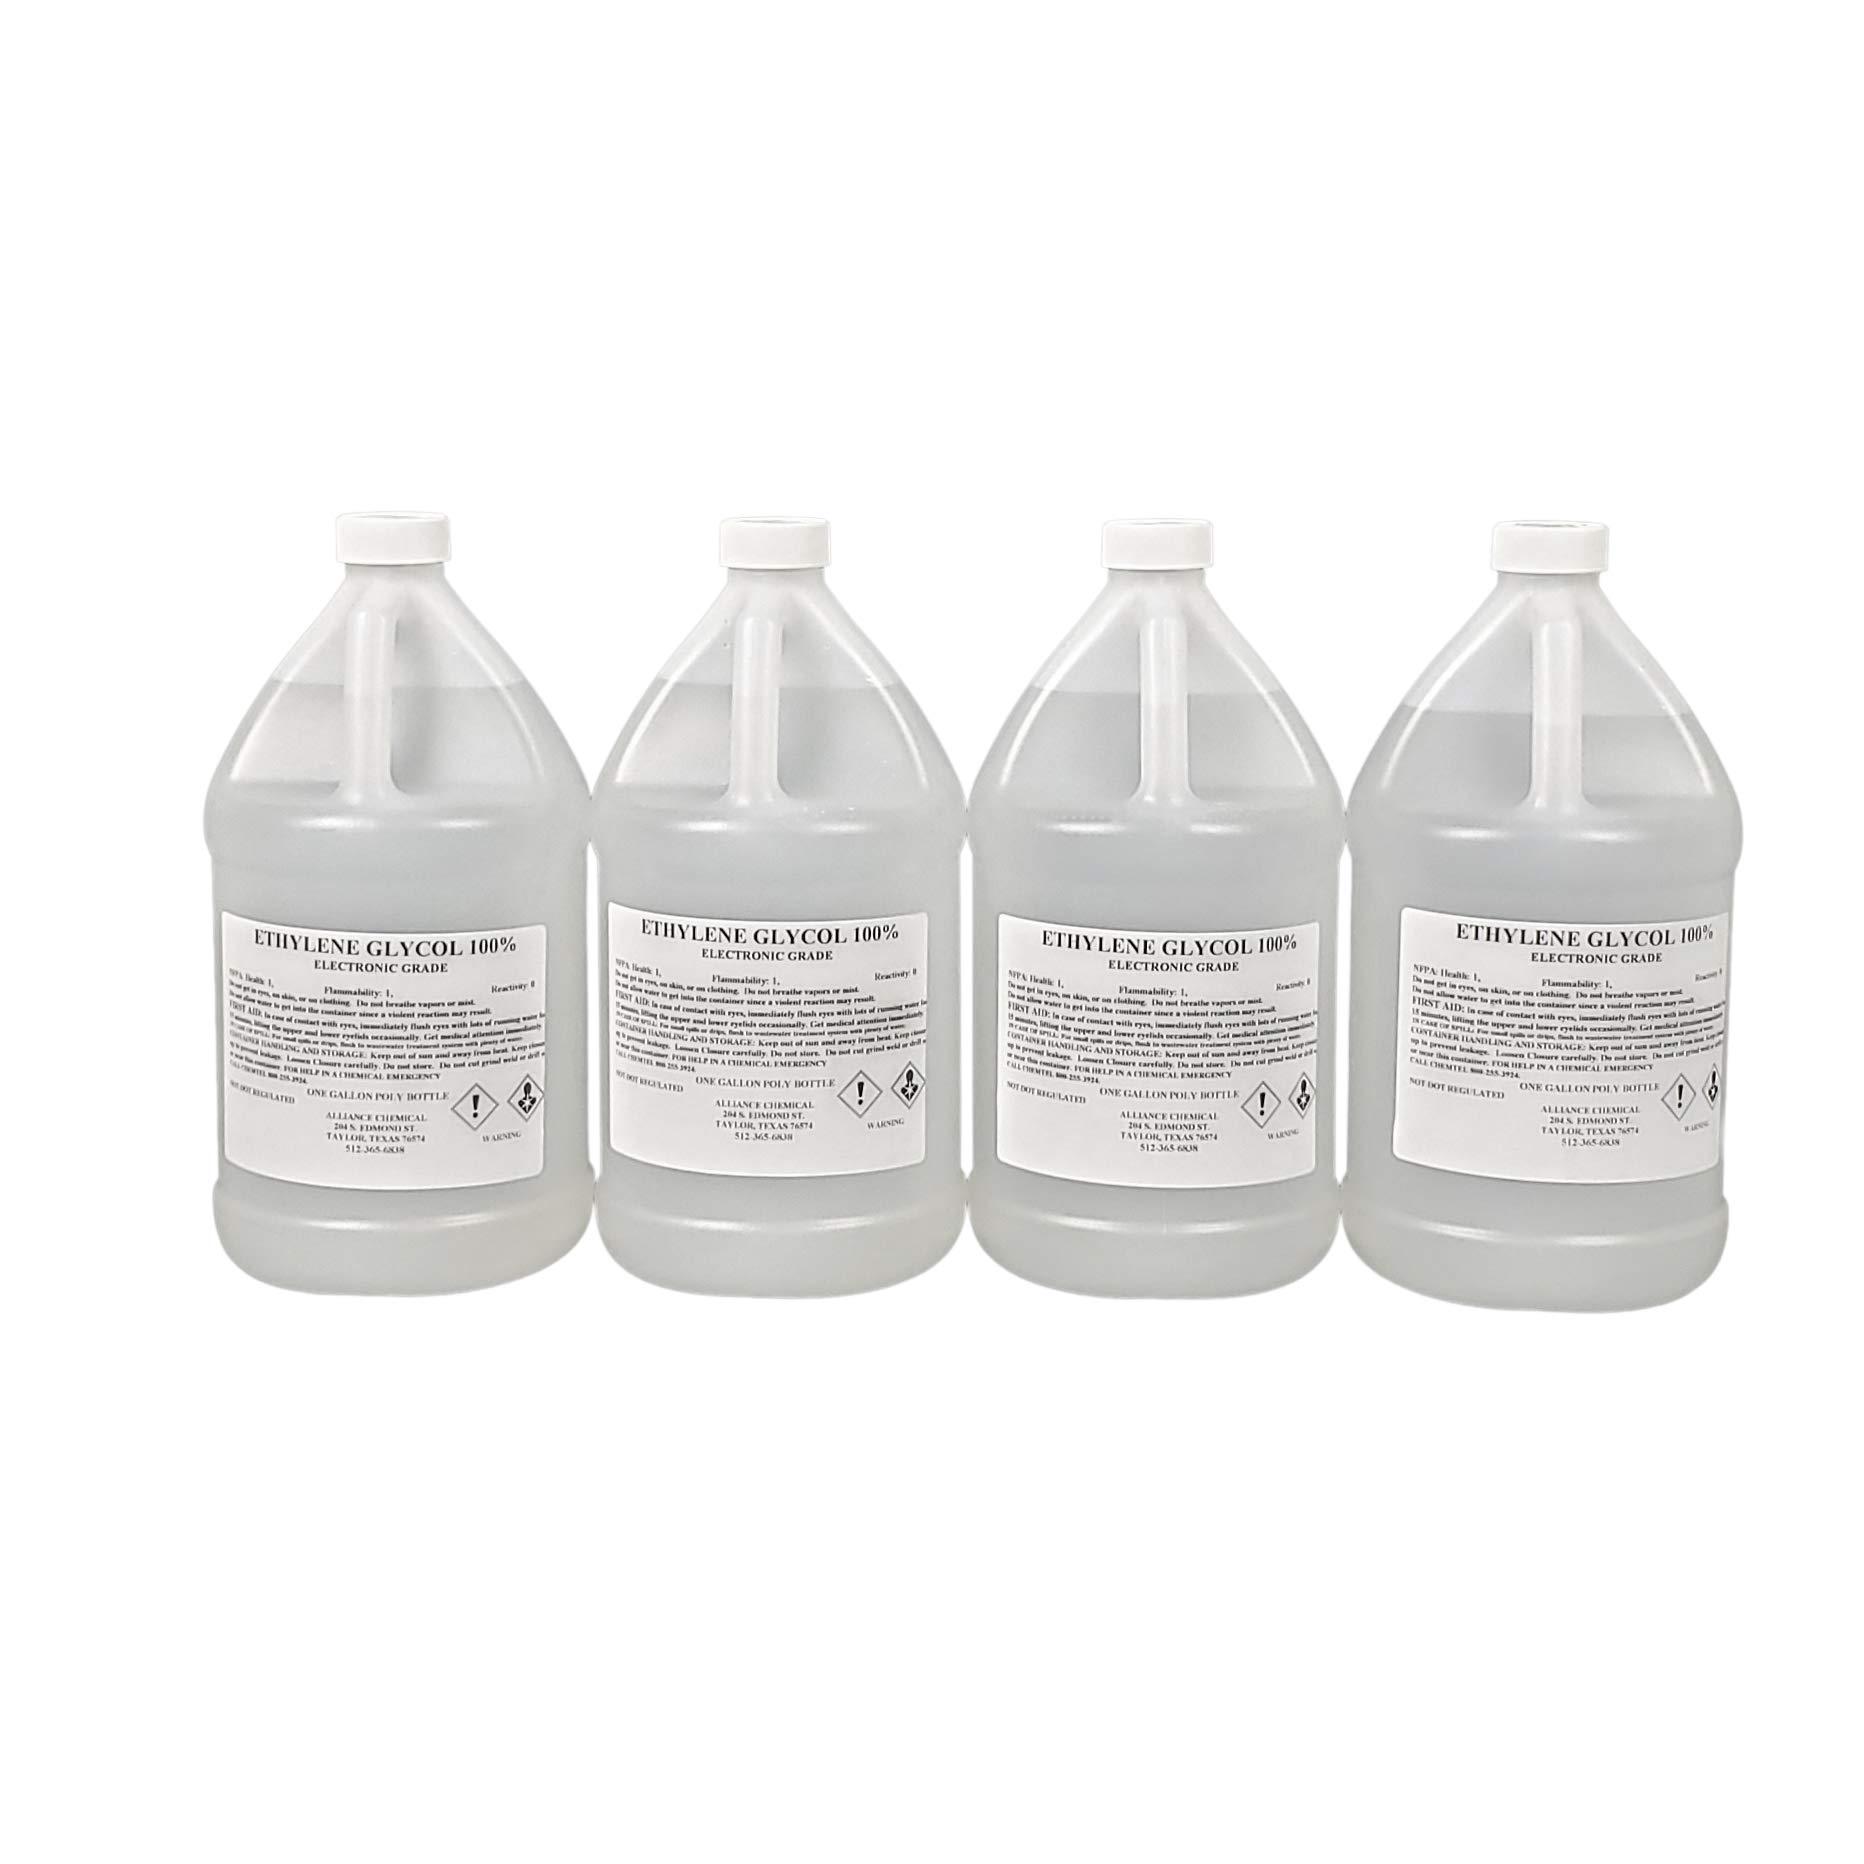 Ethylene Glycol 100% Electronic Grade -4 single gallon bottles per case